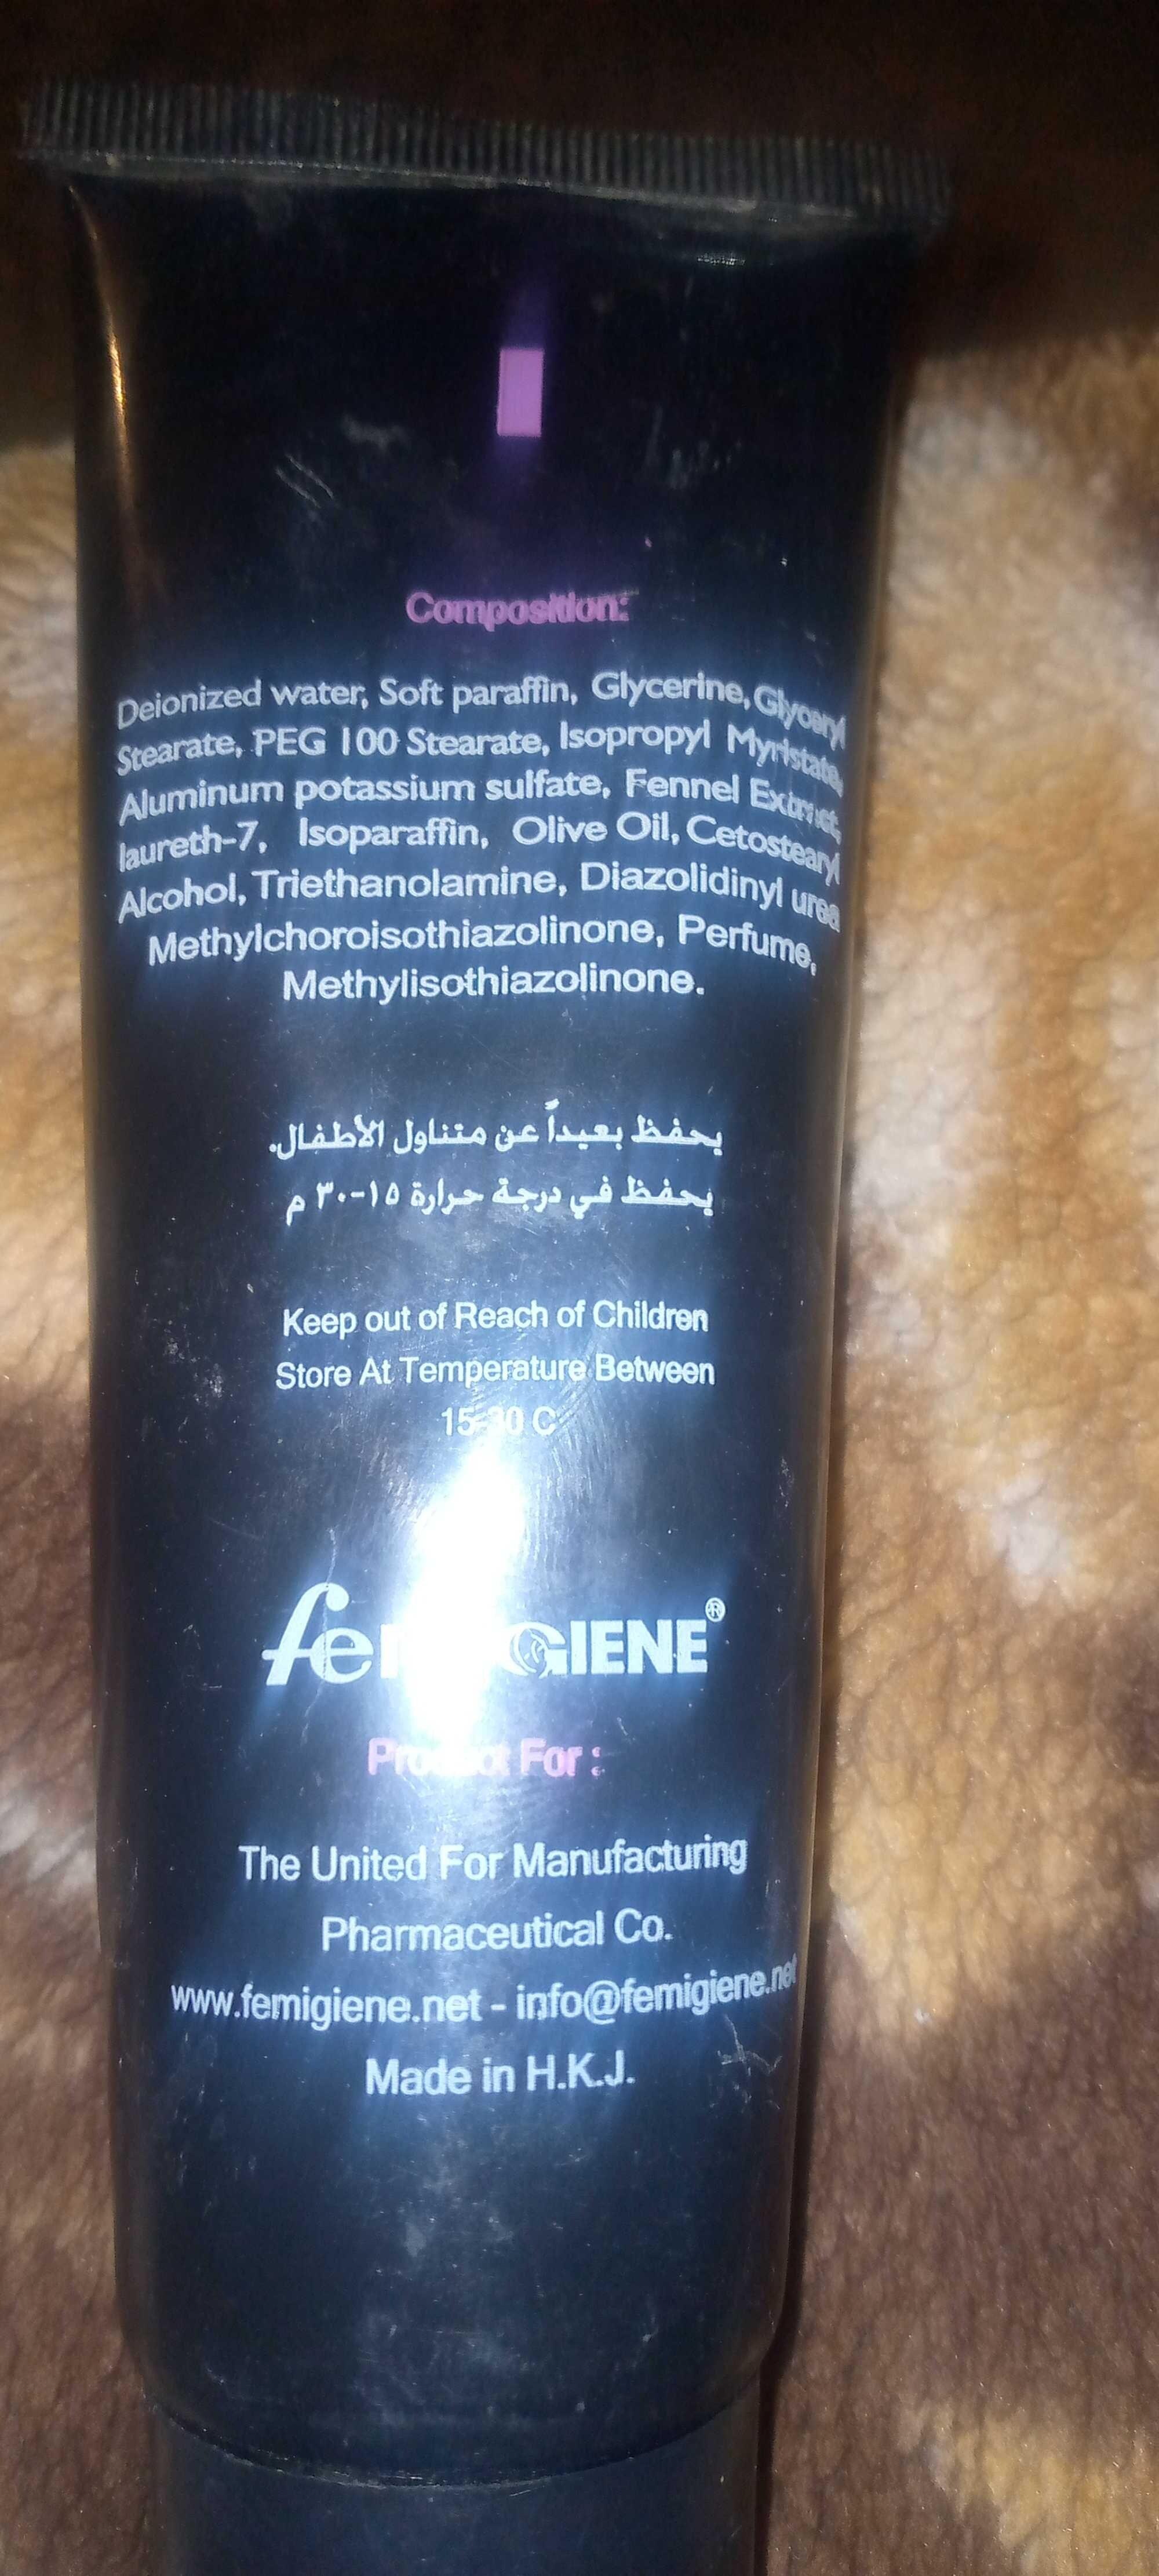 briochin vaisselle mains - Product - fr